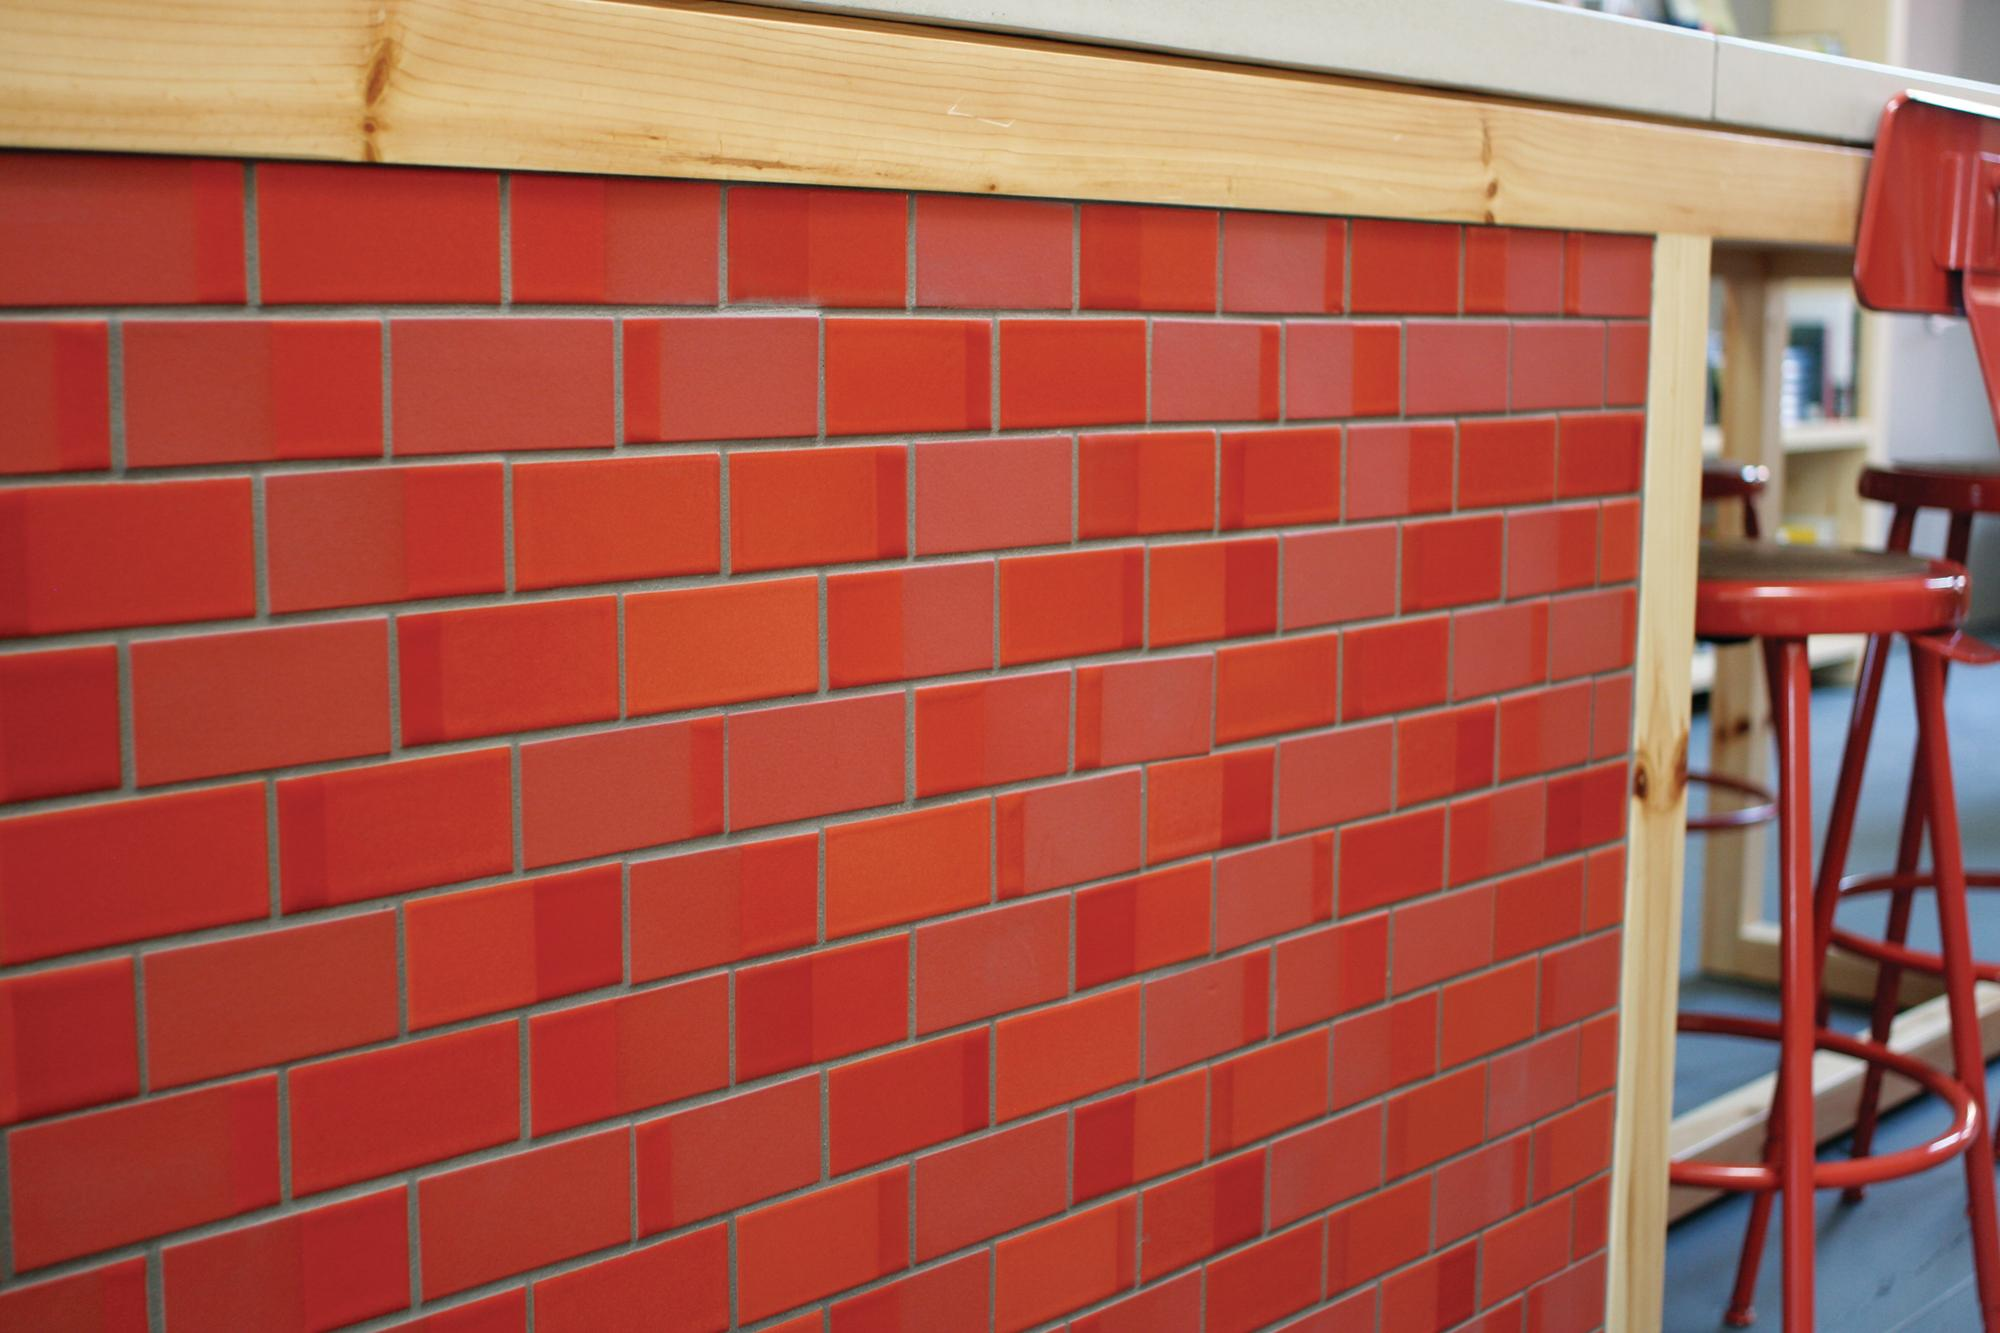 Heath Ceramics Dual-Glazed Tile Collection | Remodeling